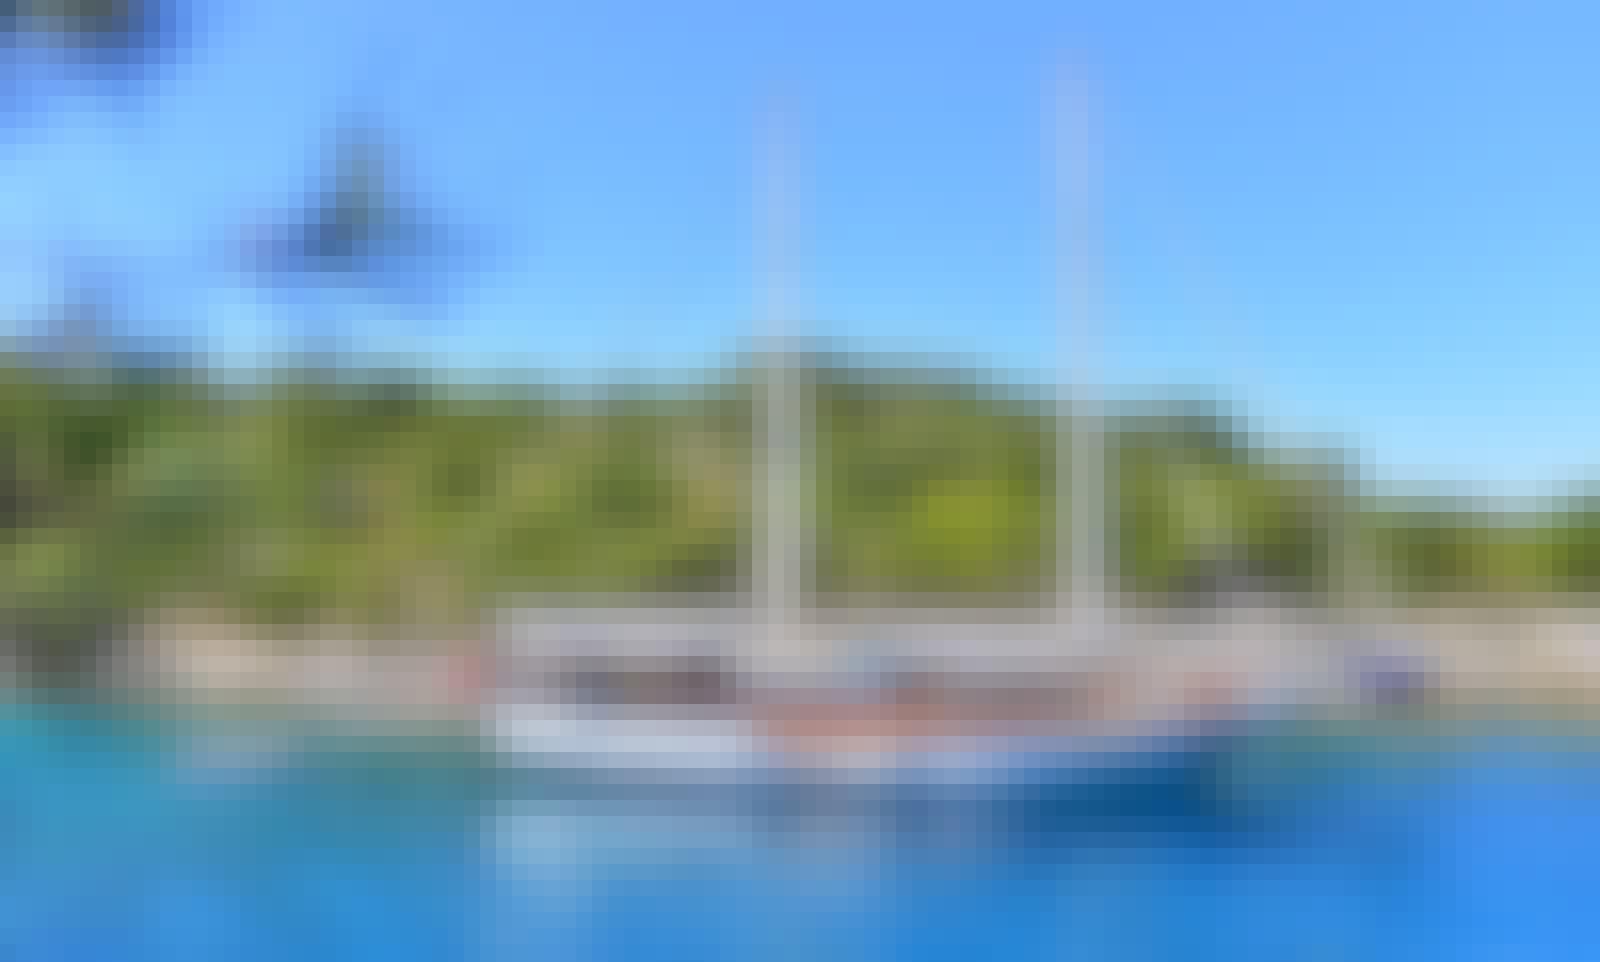 Feel the wind while onboard this beautiful 78' Sailing Gulet base in Gocek Fethiye, Muğla